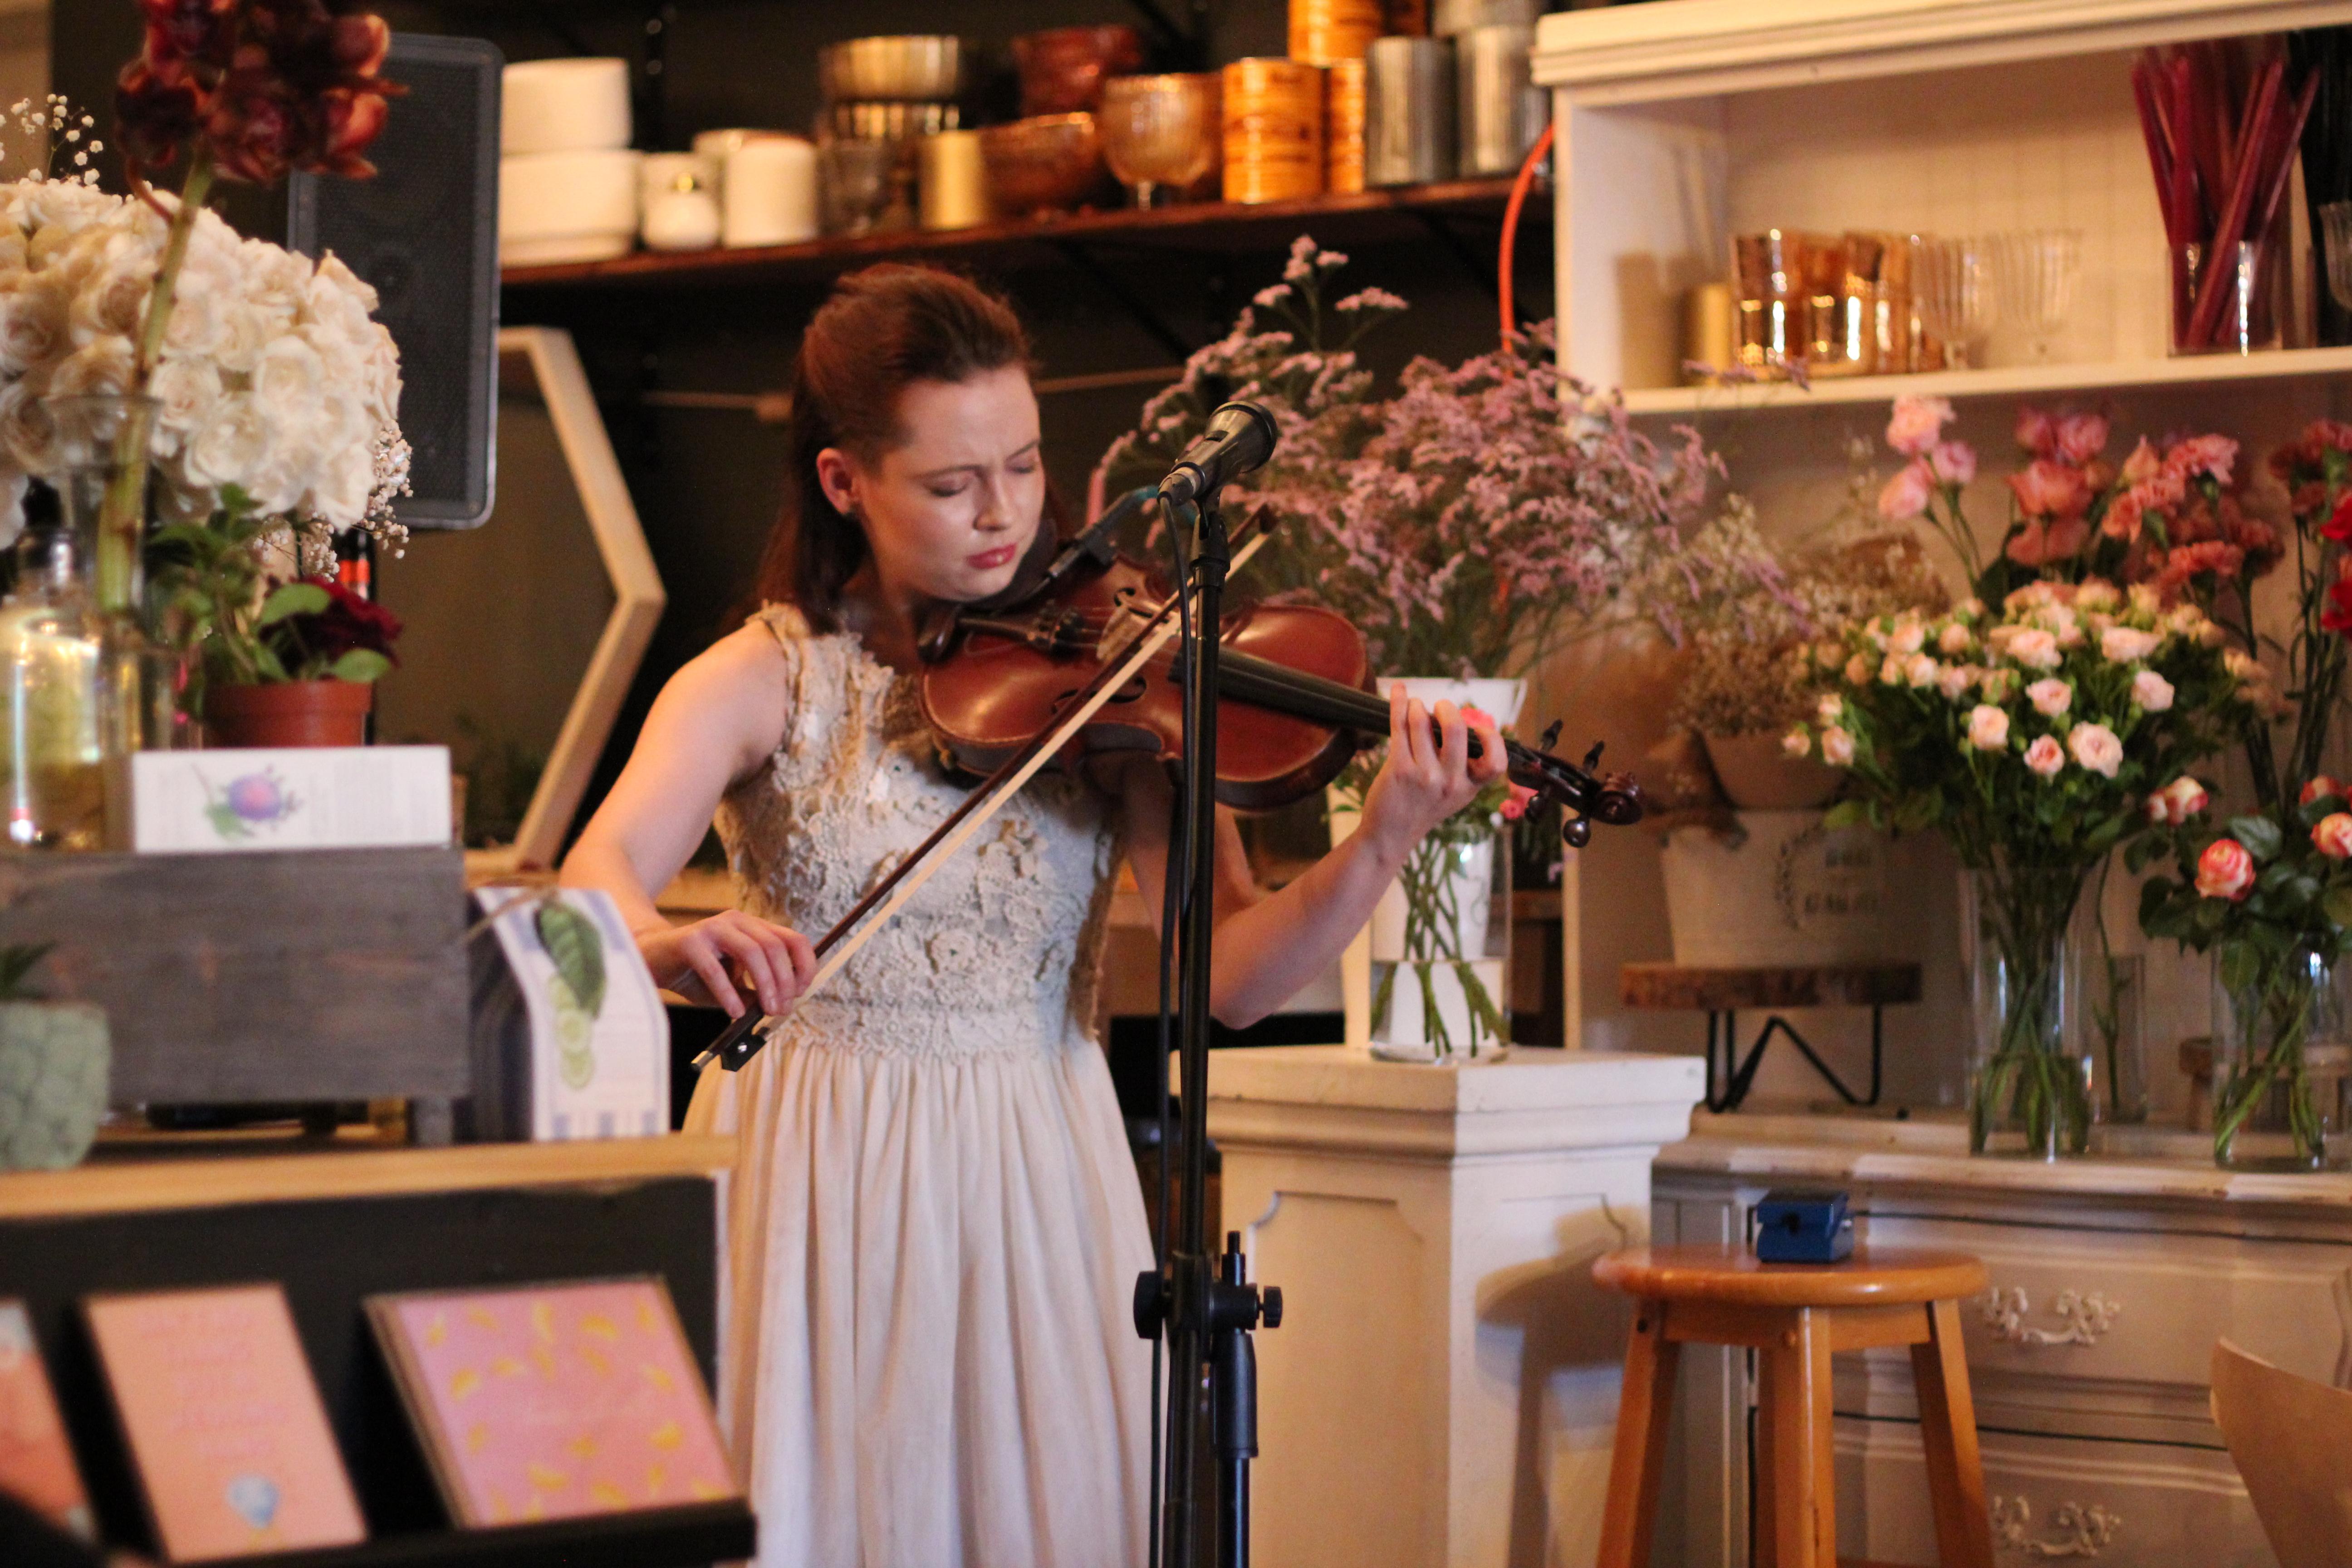 Vancorvid violin 1